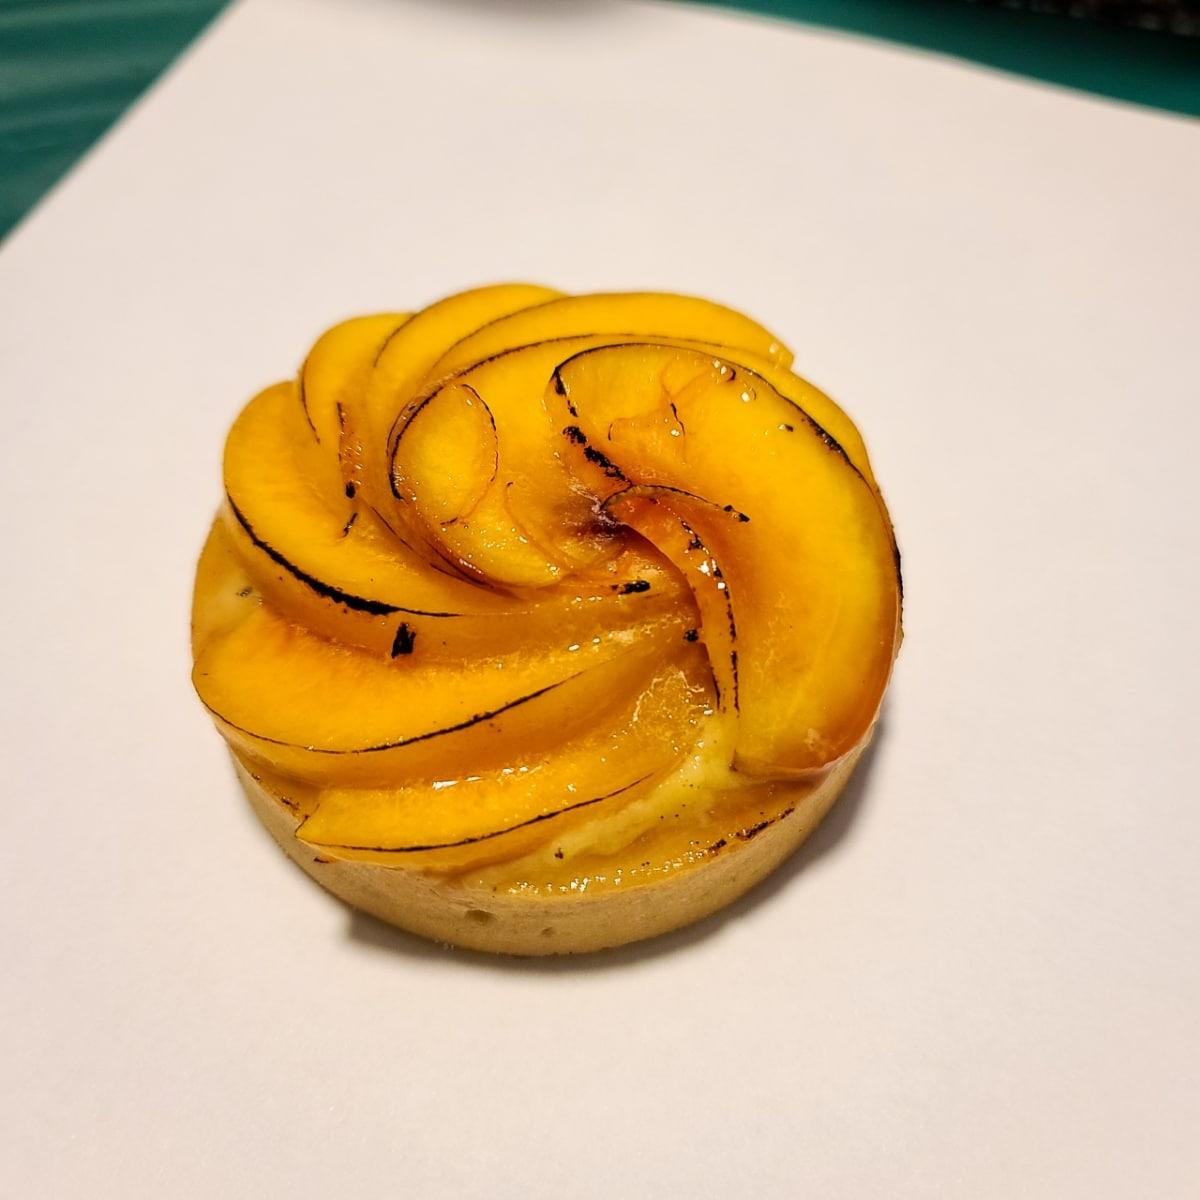 lucky chuckie dc yellow peach tart weed edible photo